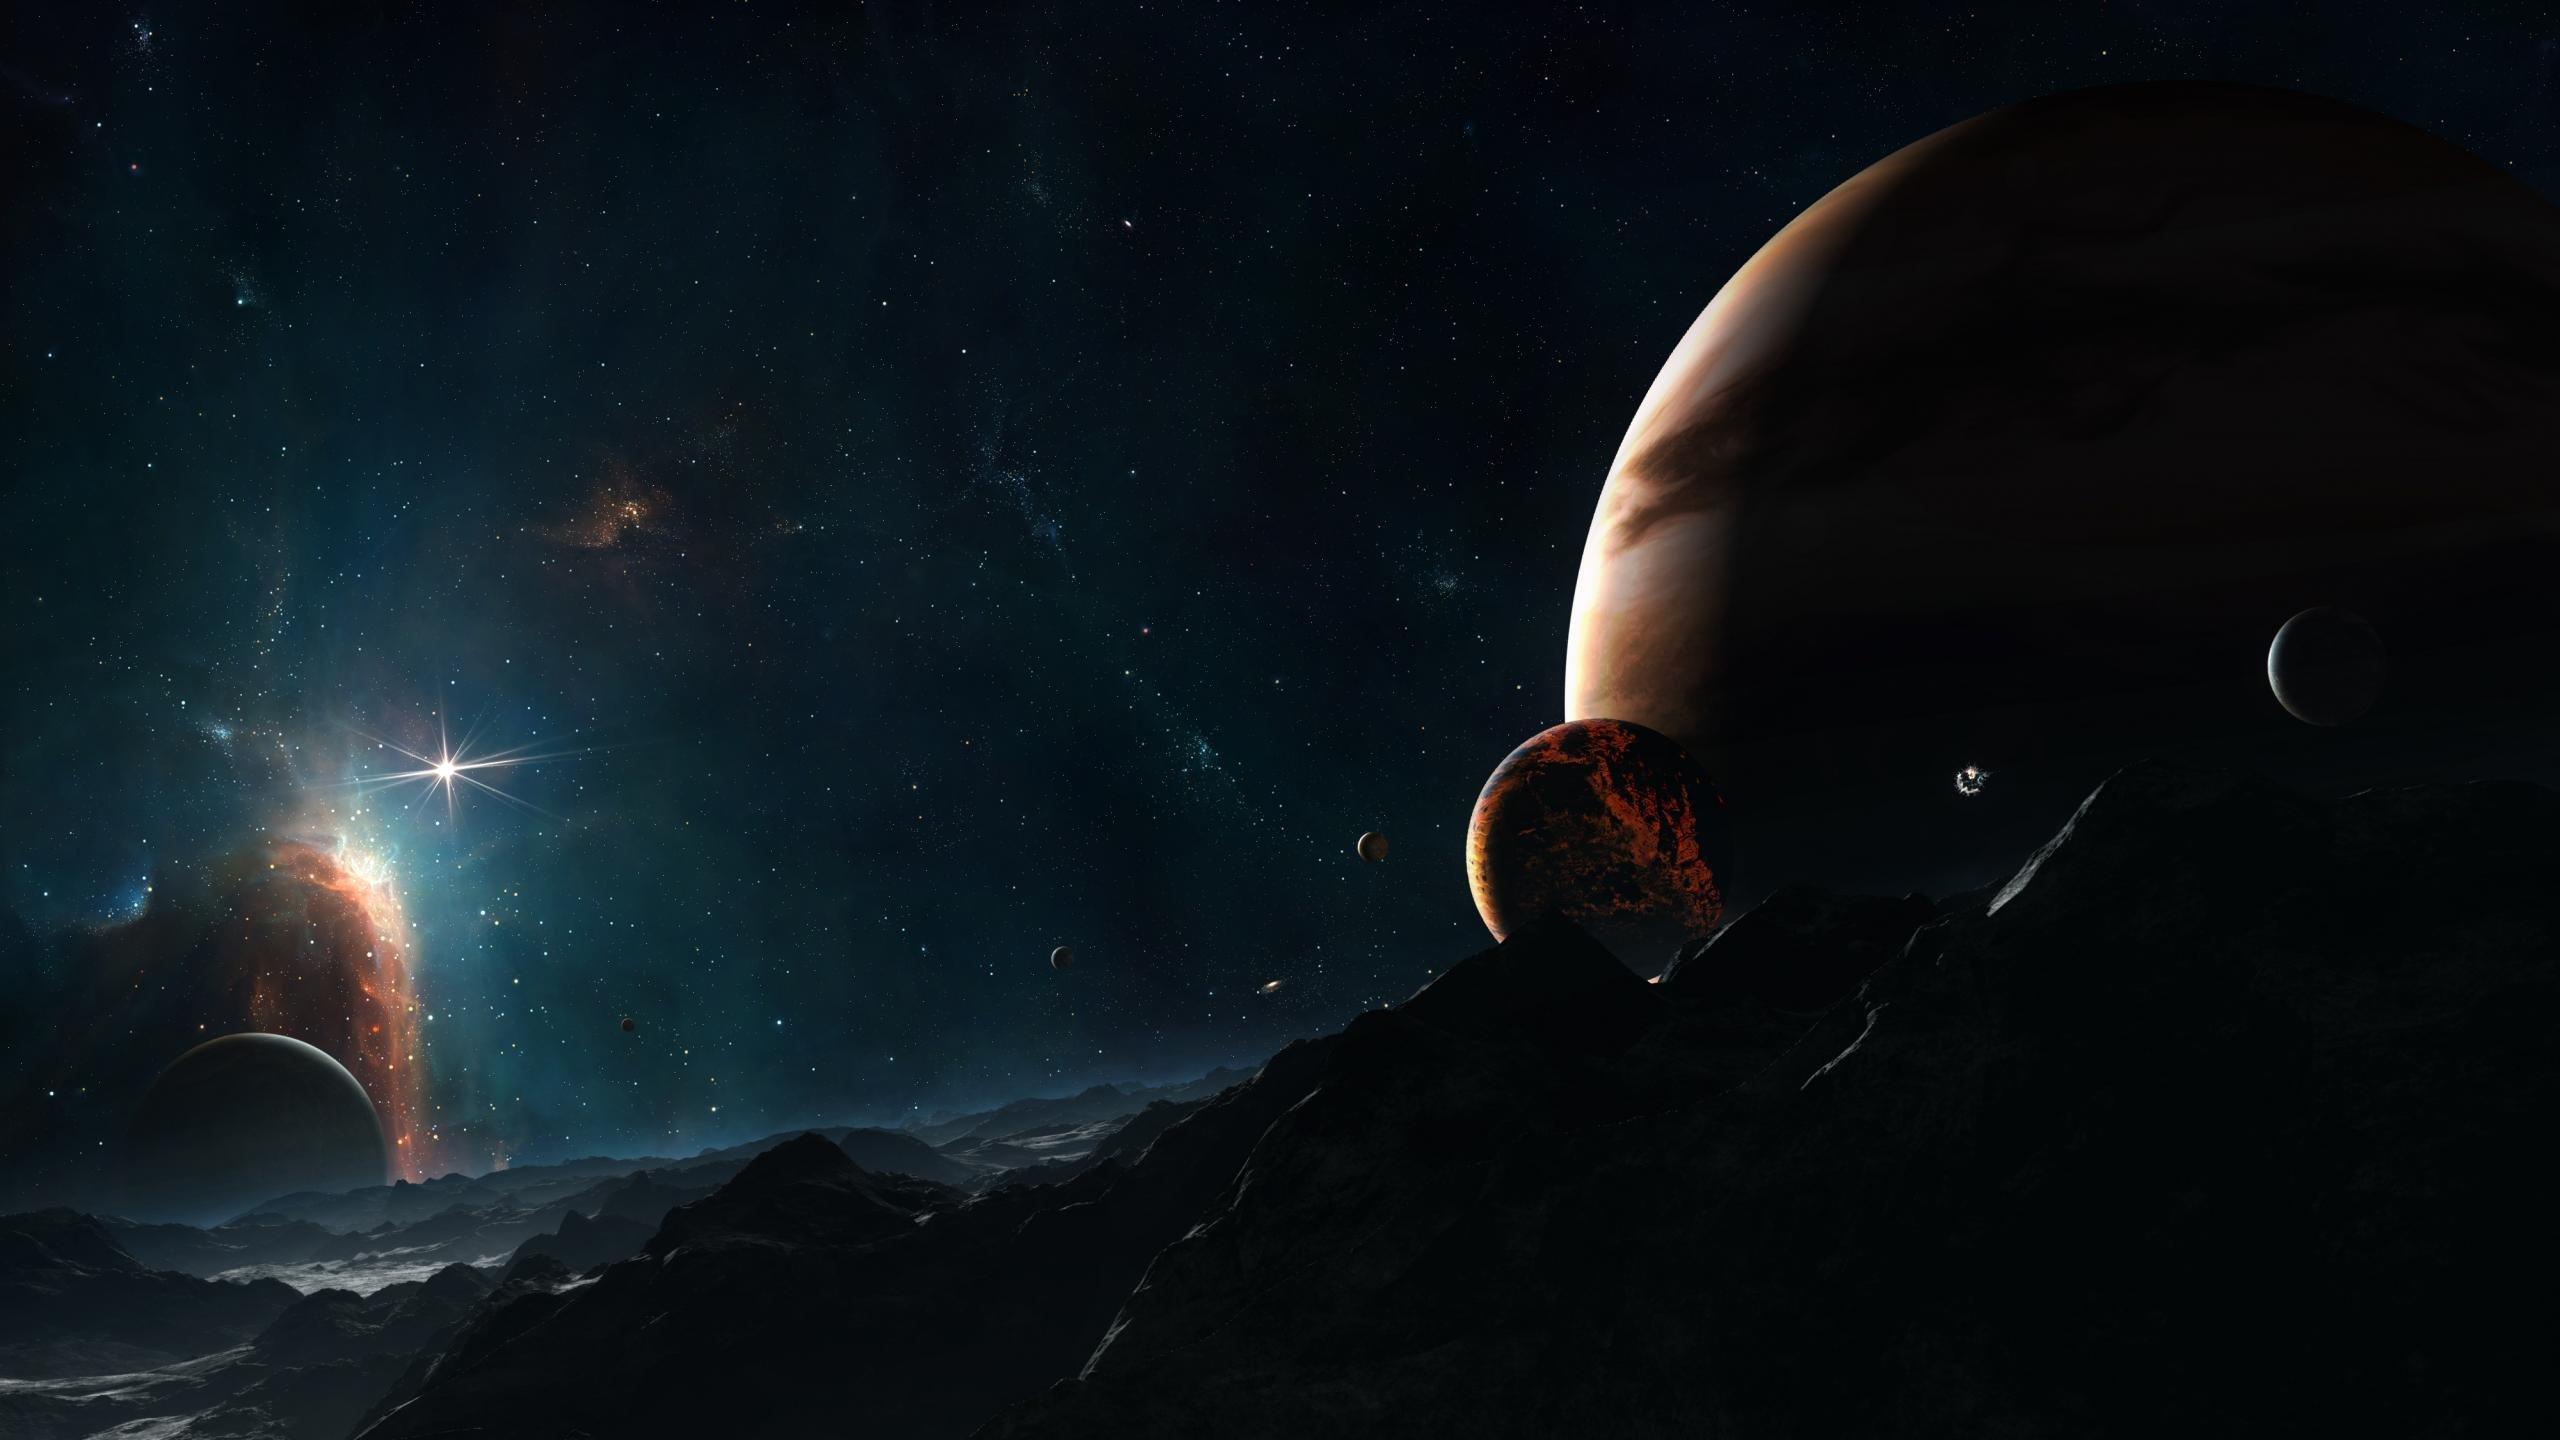 Download Hd 2560x1440 Sci Fi Landscape Pc Wallpaper Id 233179 For Free